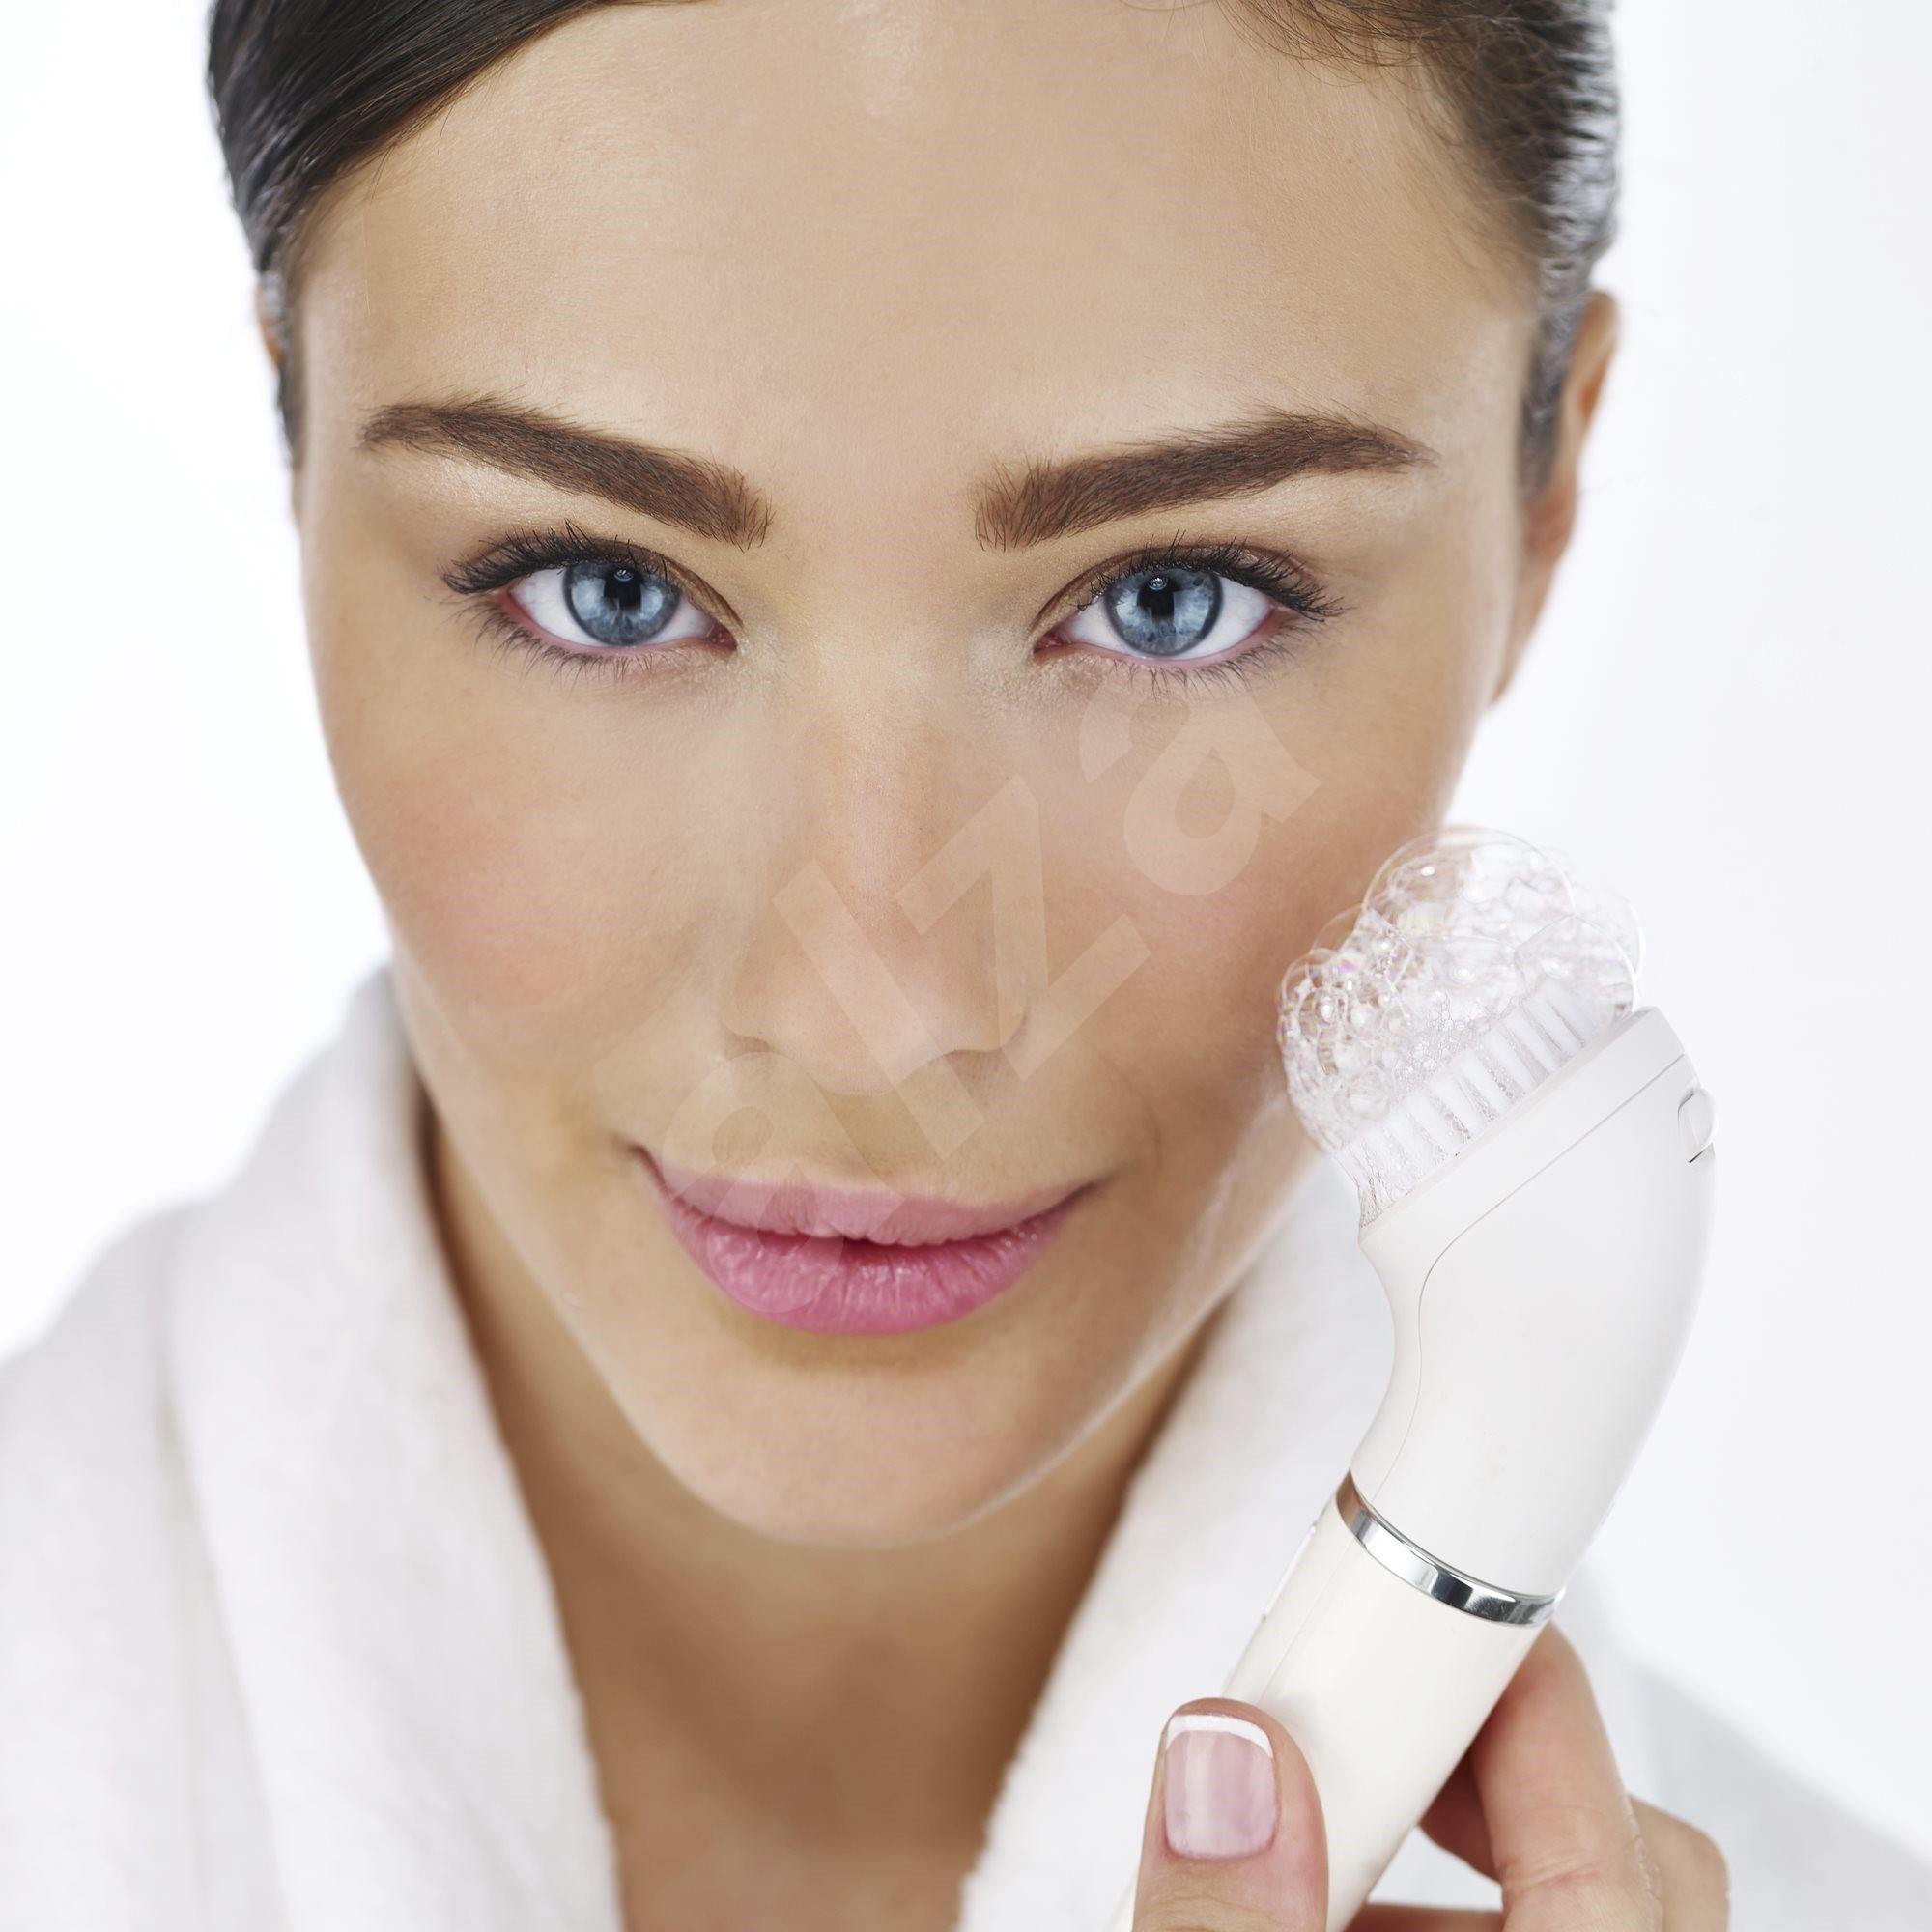 how to clean braun face epilator